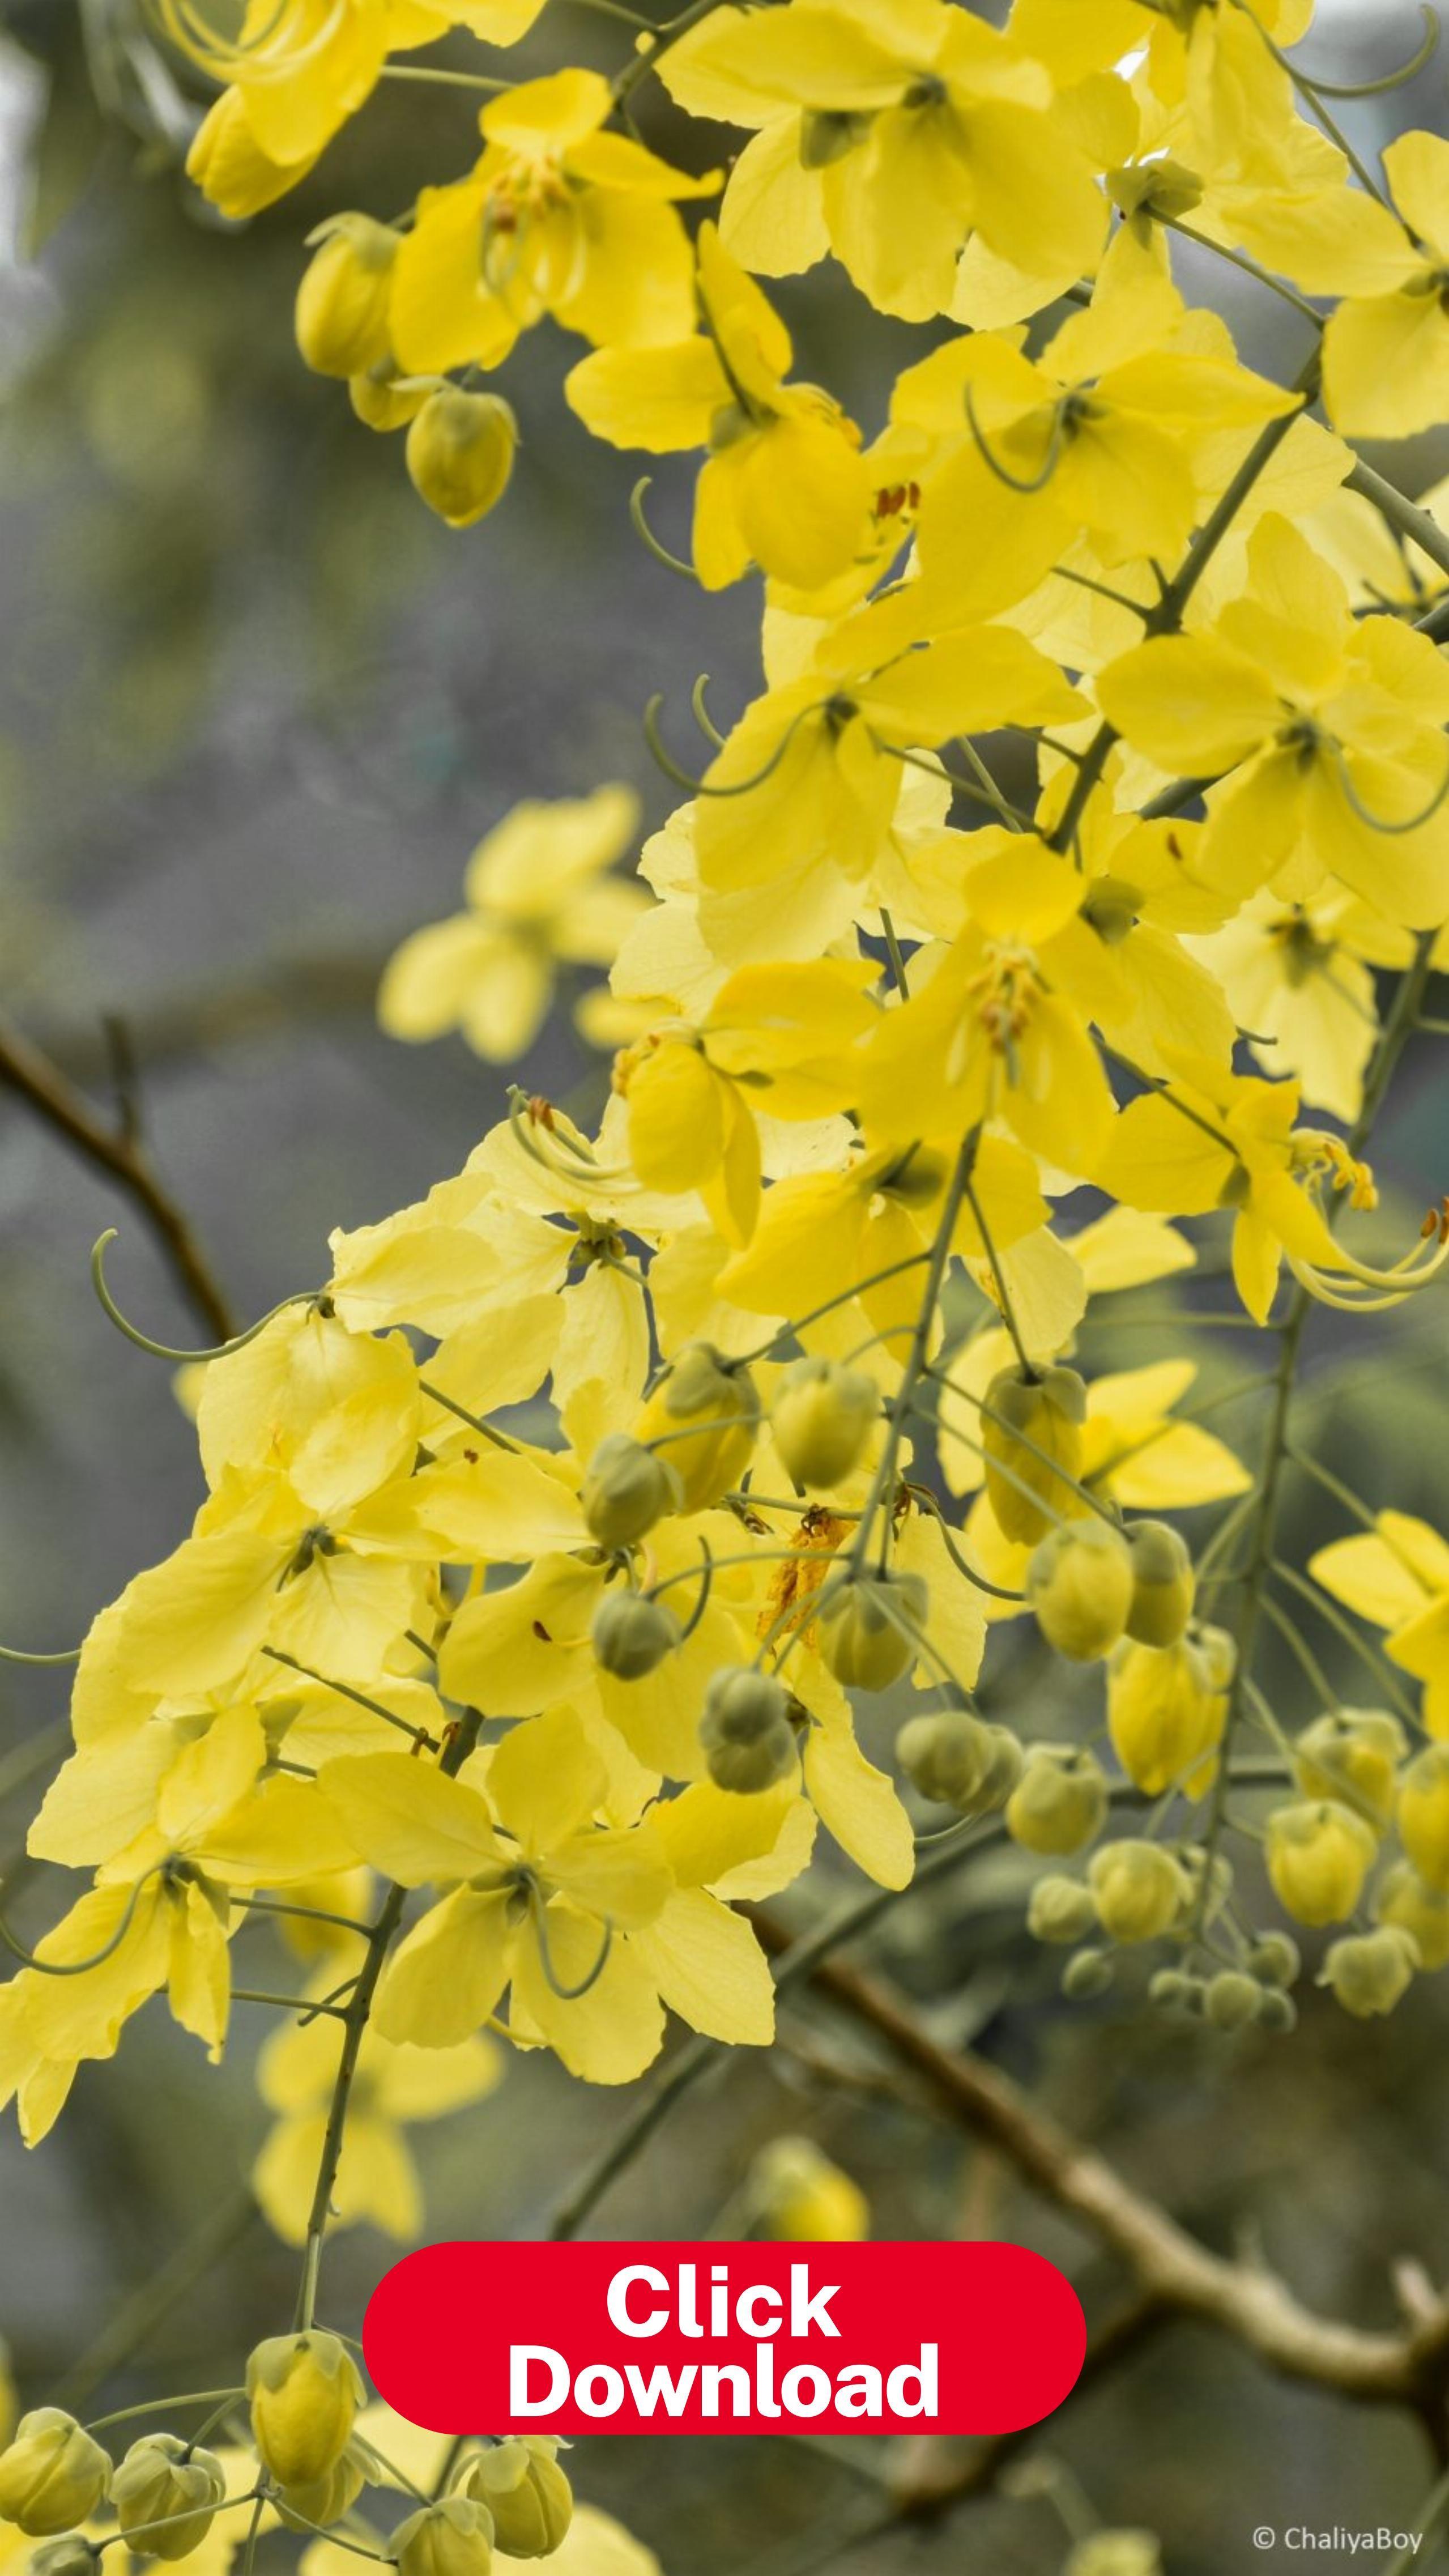 Las Canciones Mas Escuchadas En El Mundo Sazum Mobile Wallpaper Flower Wallpaper Amazing Flowers Fantastic yellow flower hd wallpaper